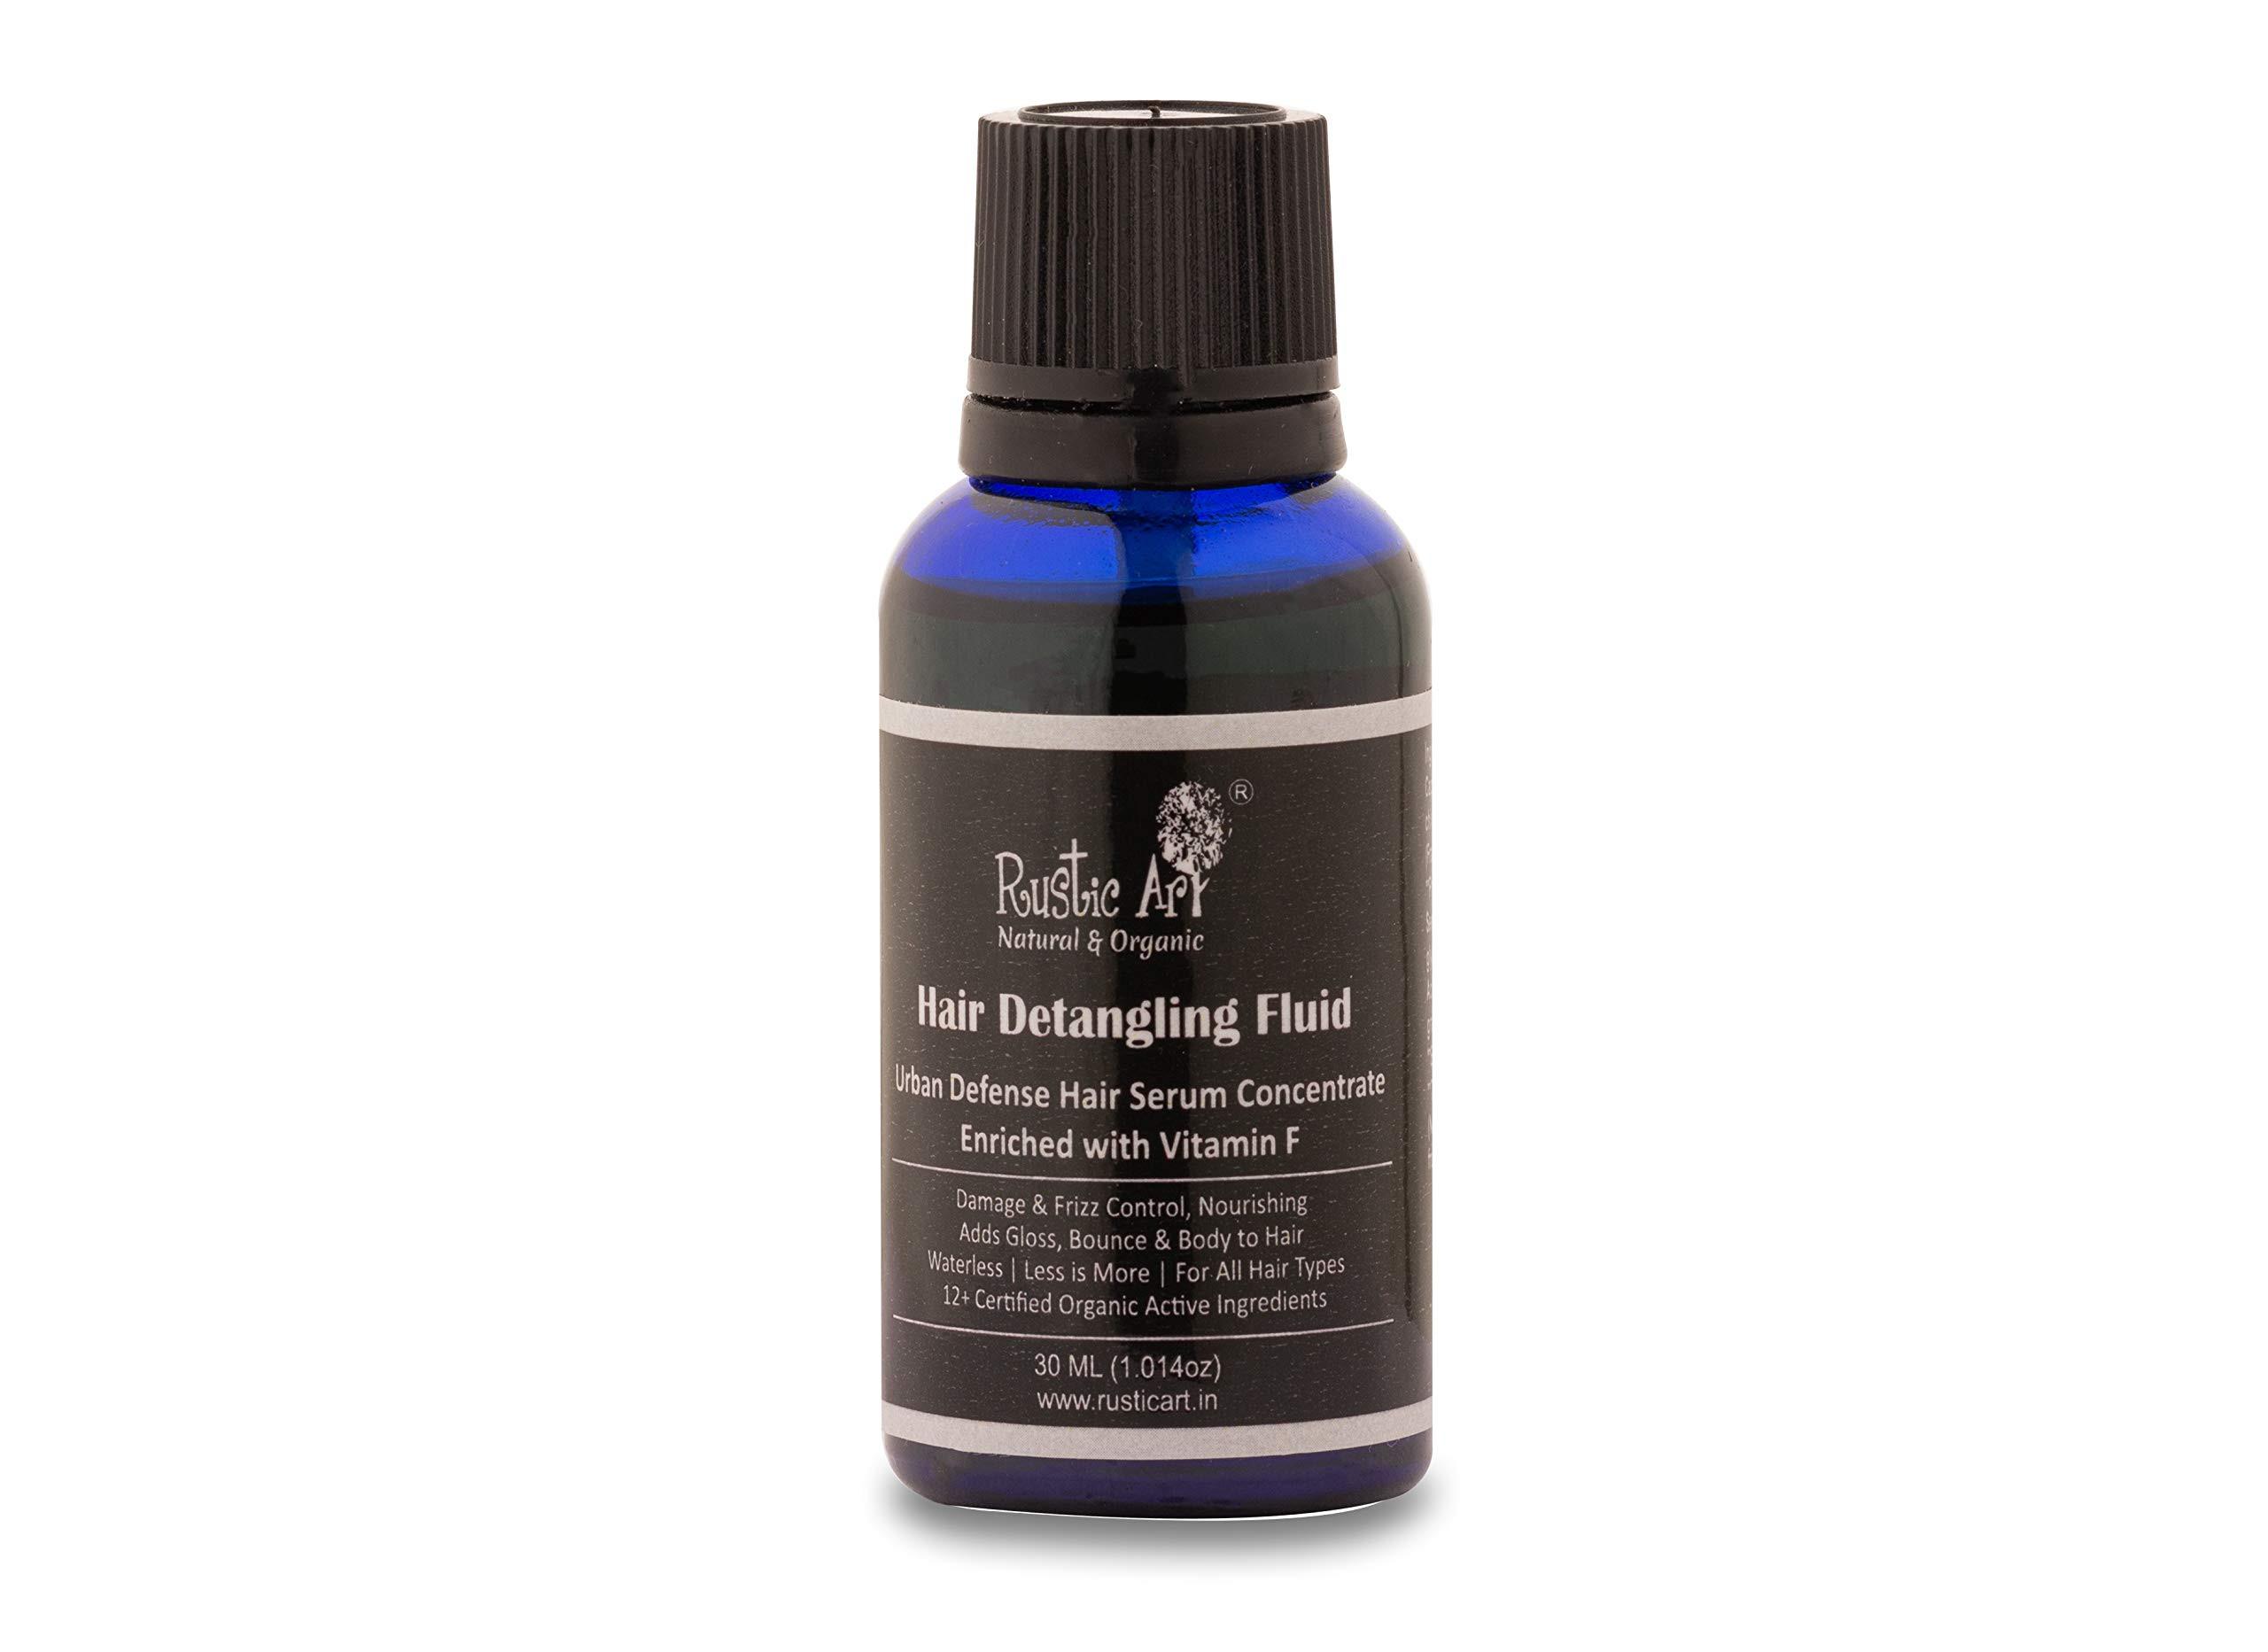 Rustic Art Organic Hair Detangling Fluid with Vit. F | Urban Defense Hair Serum Concentrate | 30 ml